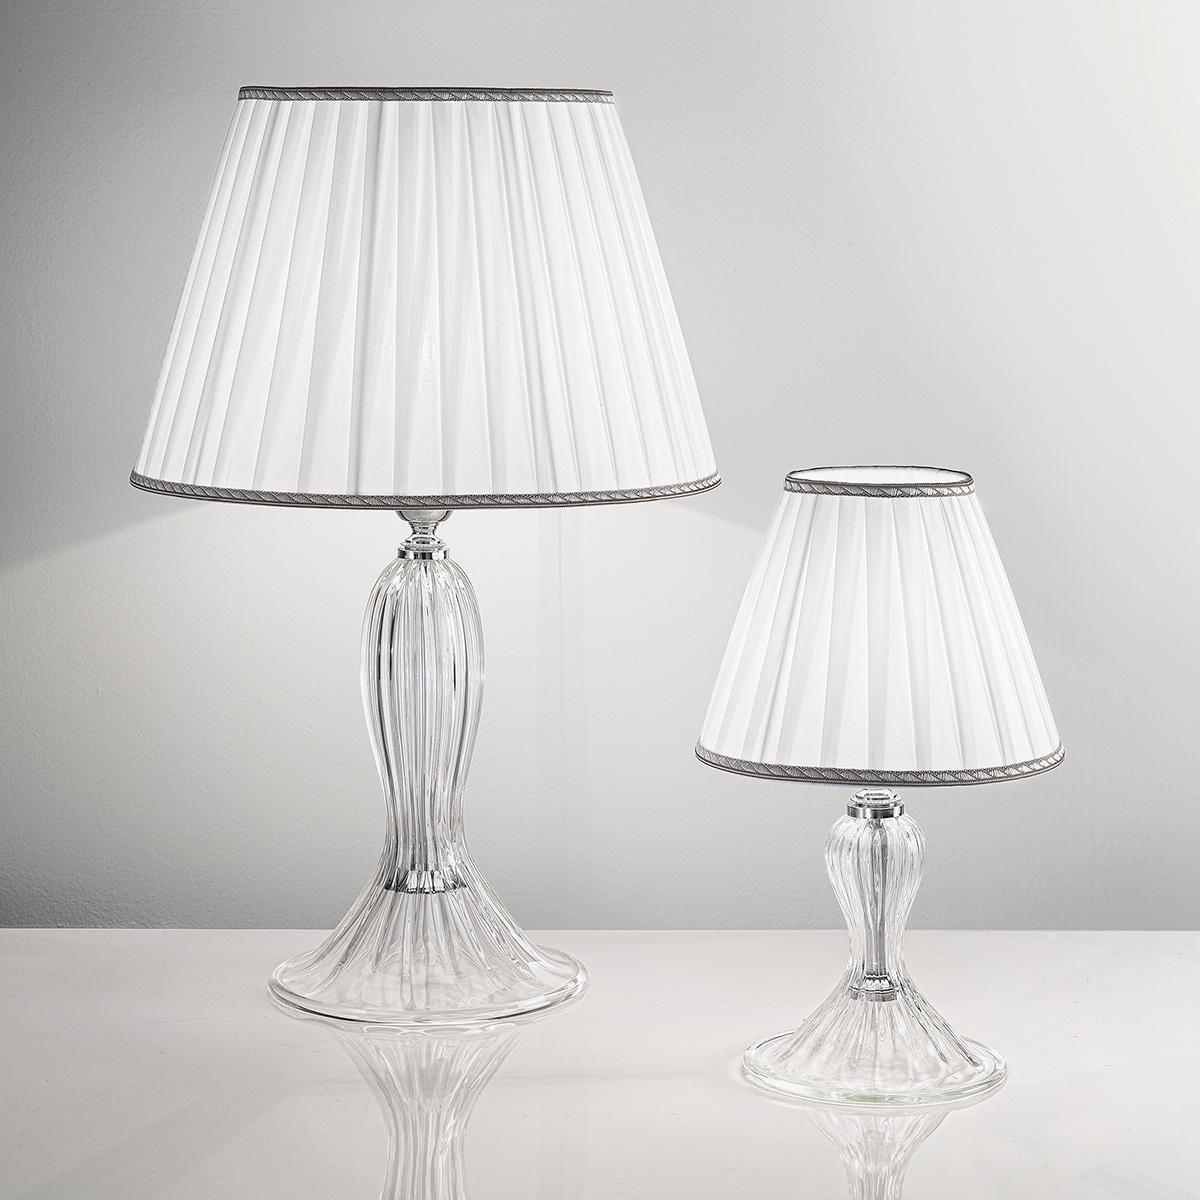 """Cloe"" lampara de sobremesa de Murano - 1 luce - transparente"